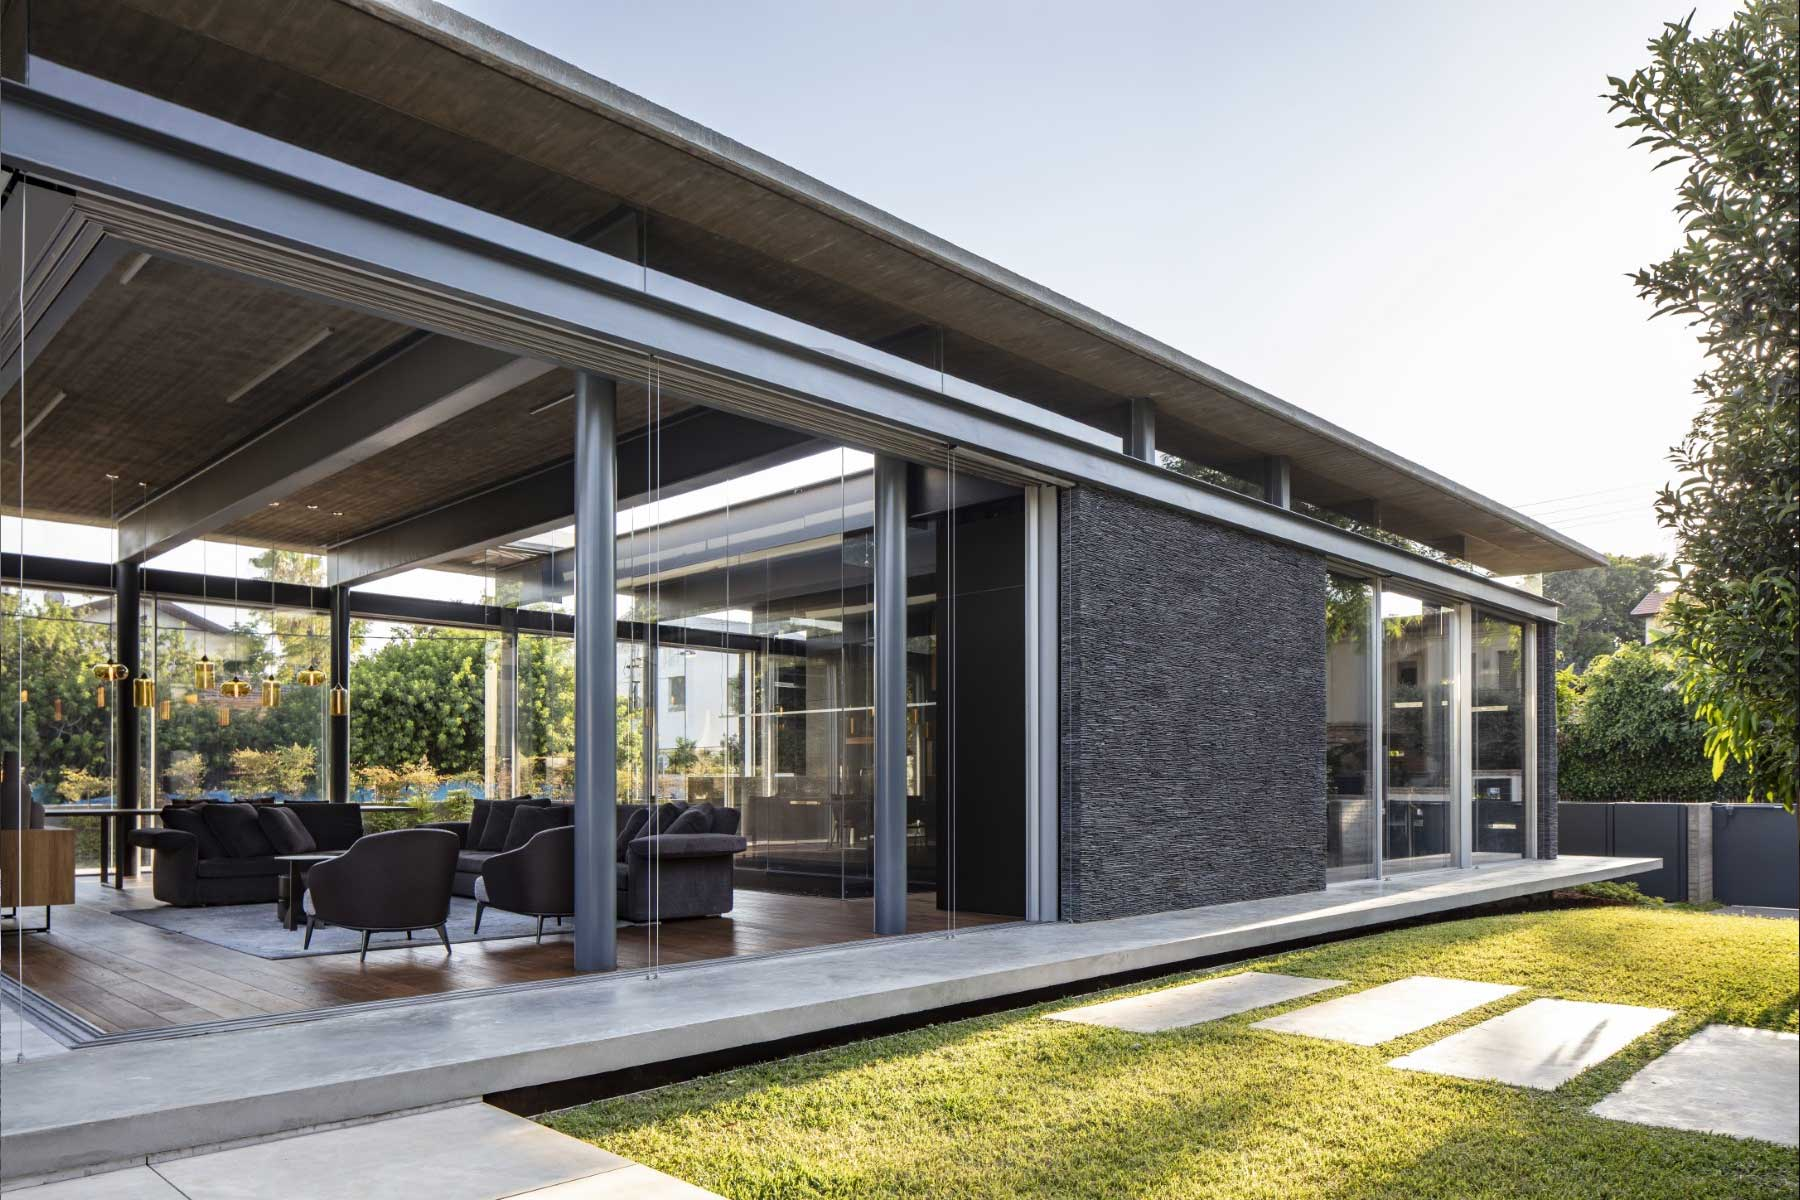 Pavilion House Pavilion-House-Pitsou-Kedem_06